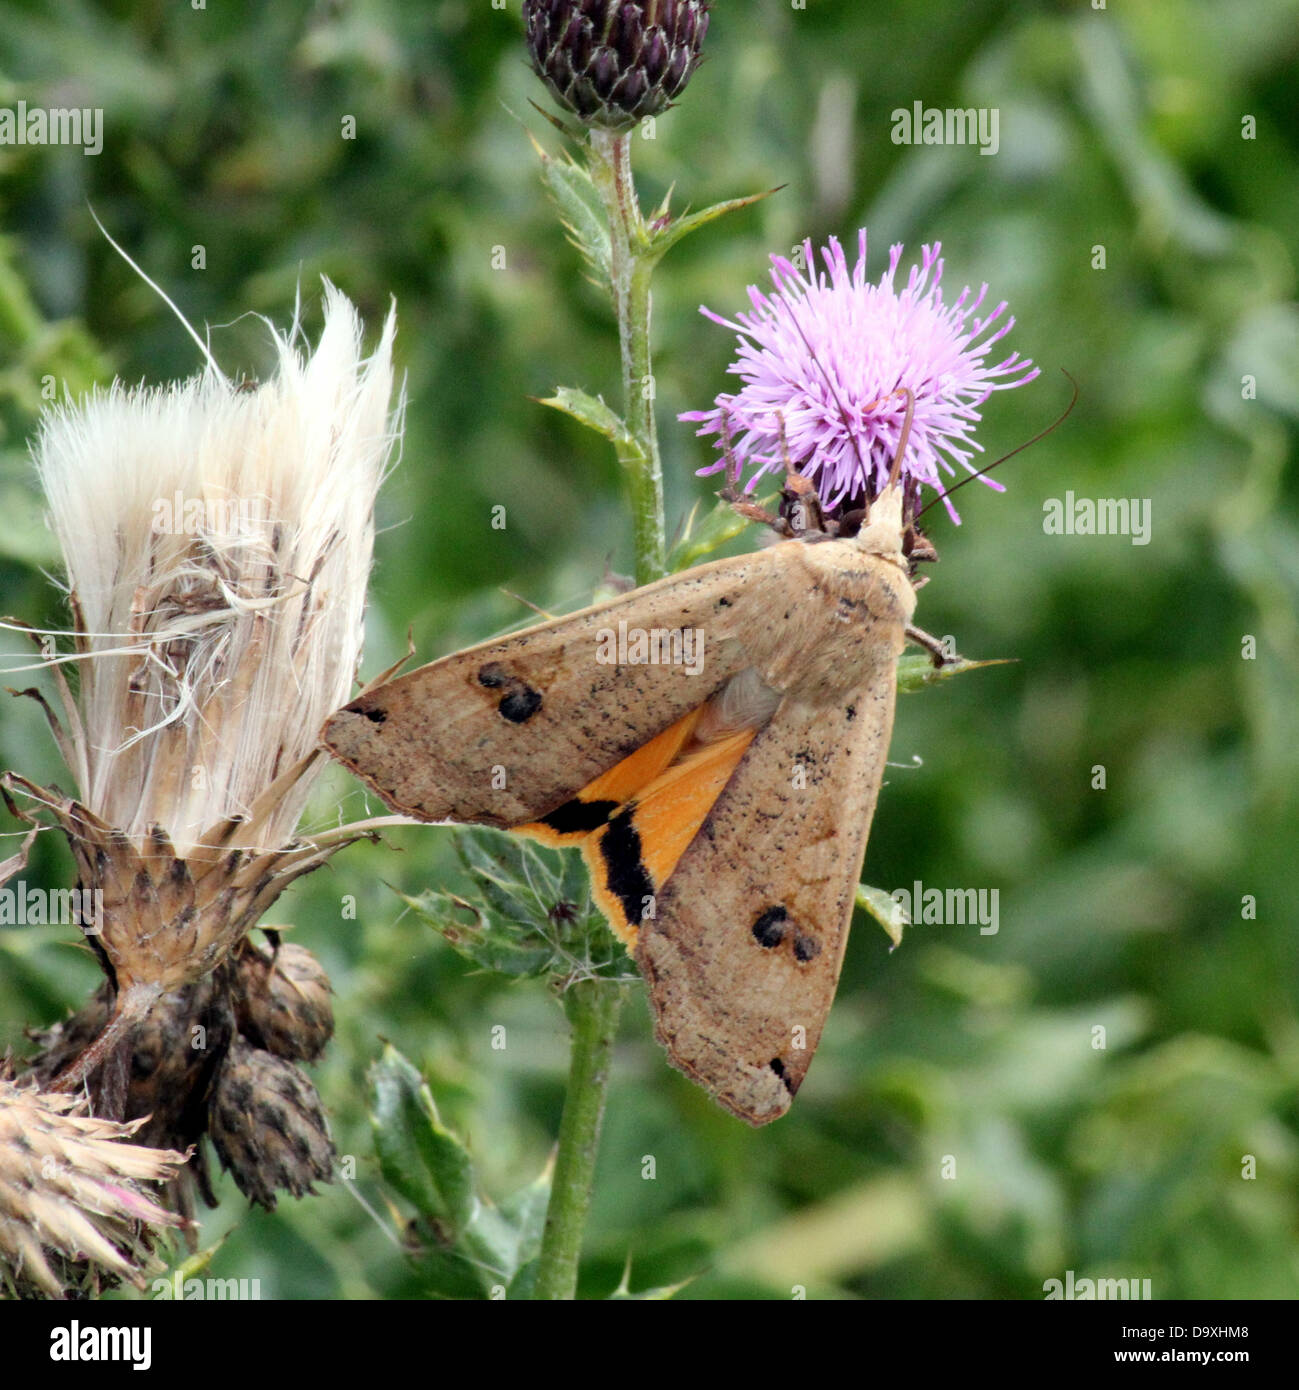 Large Yellow Underwing (Noctua pronuba) moth foraging on a purple thistle flower - Stock Image